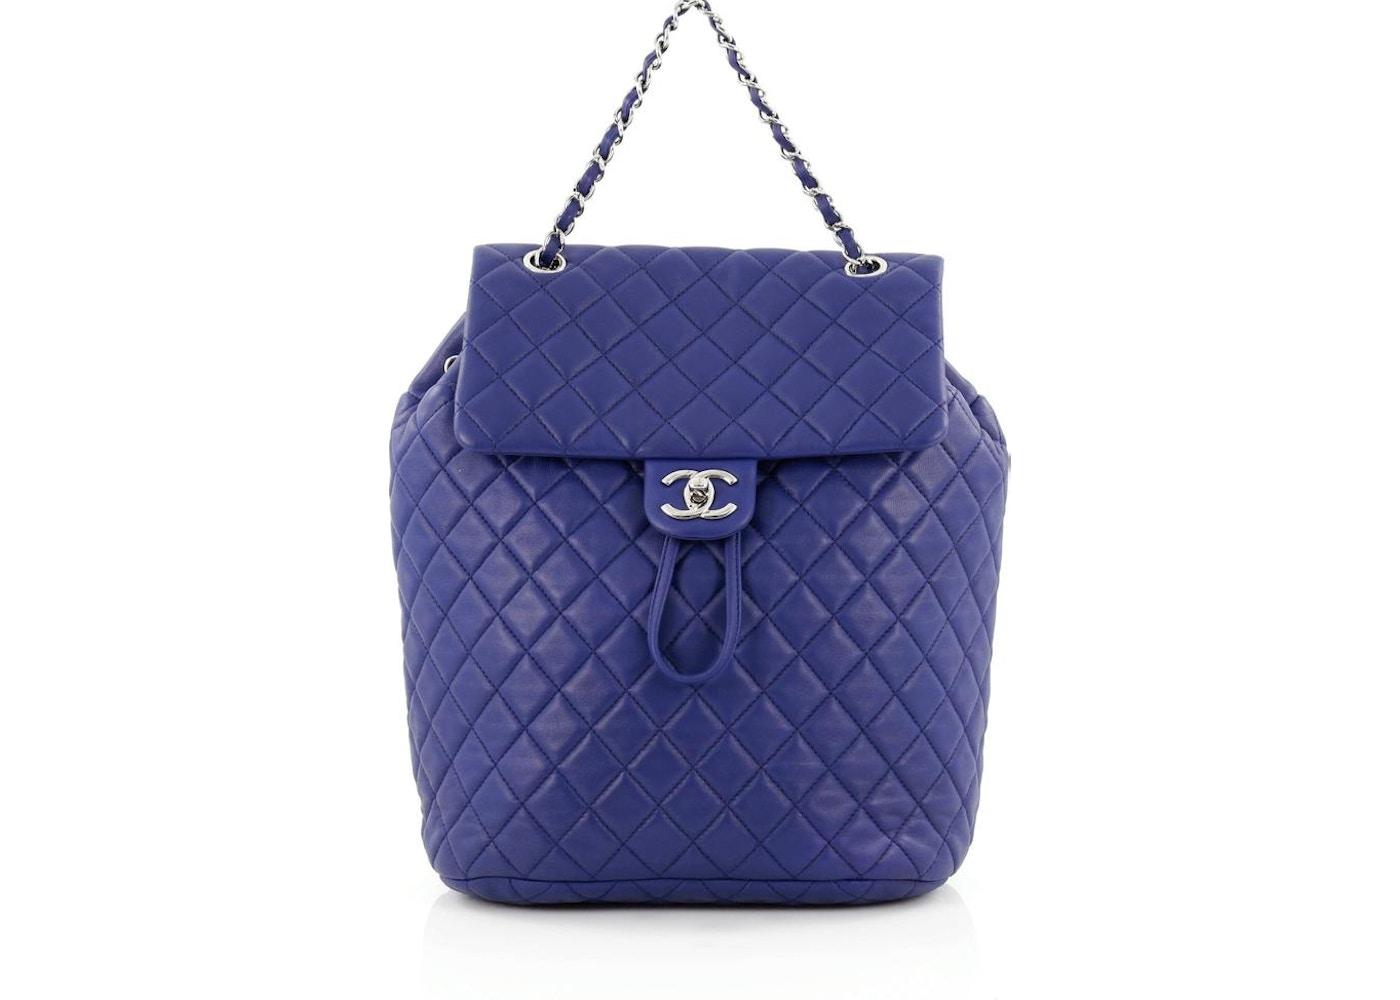 46db9b8b1dba Chanel Urban Spirit Backpack Quilted Diamond Large Royal Blue. Quilted  Diamond Large Royal Blue